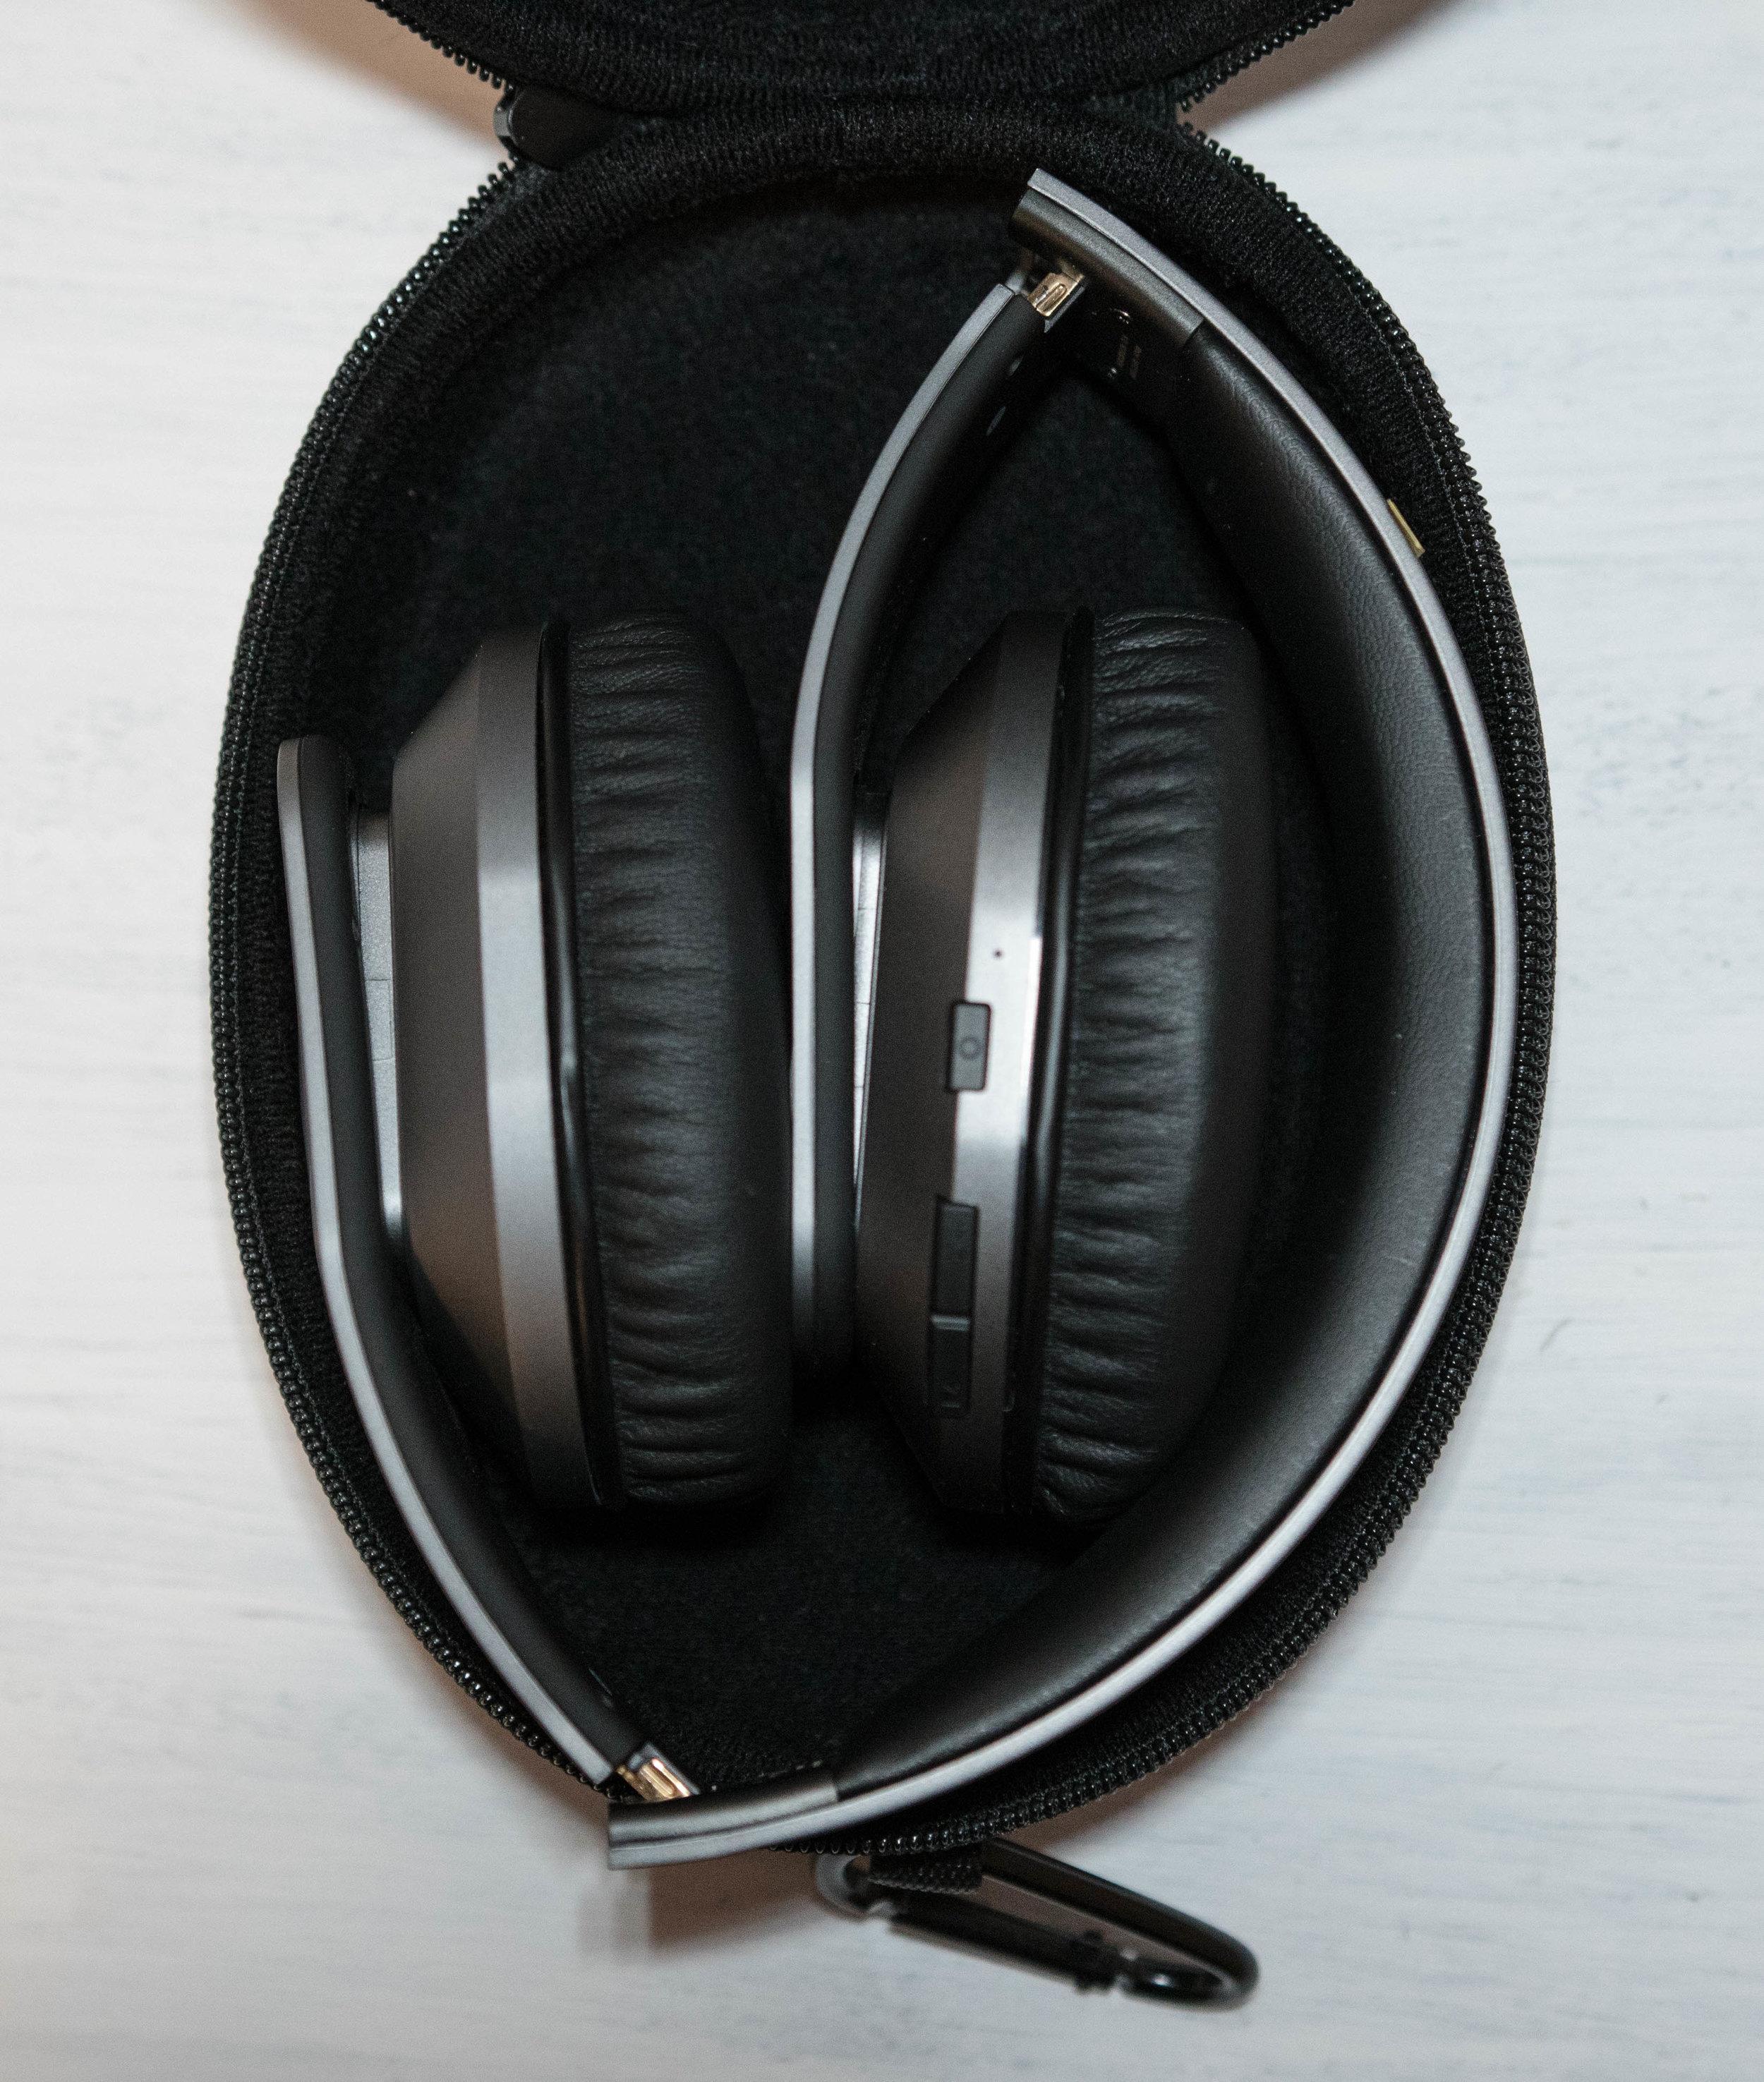 Hammo wireless headphones in carry case.